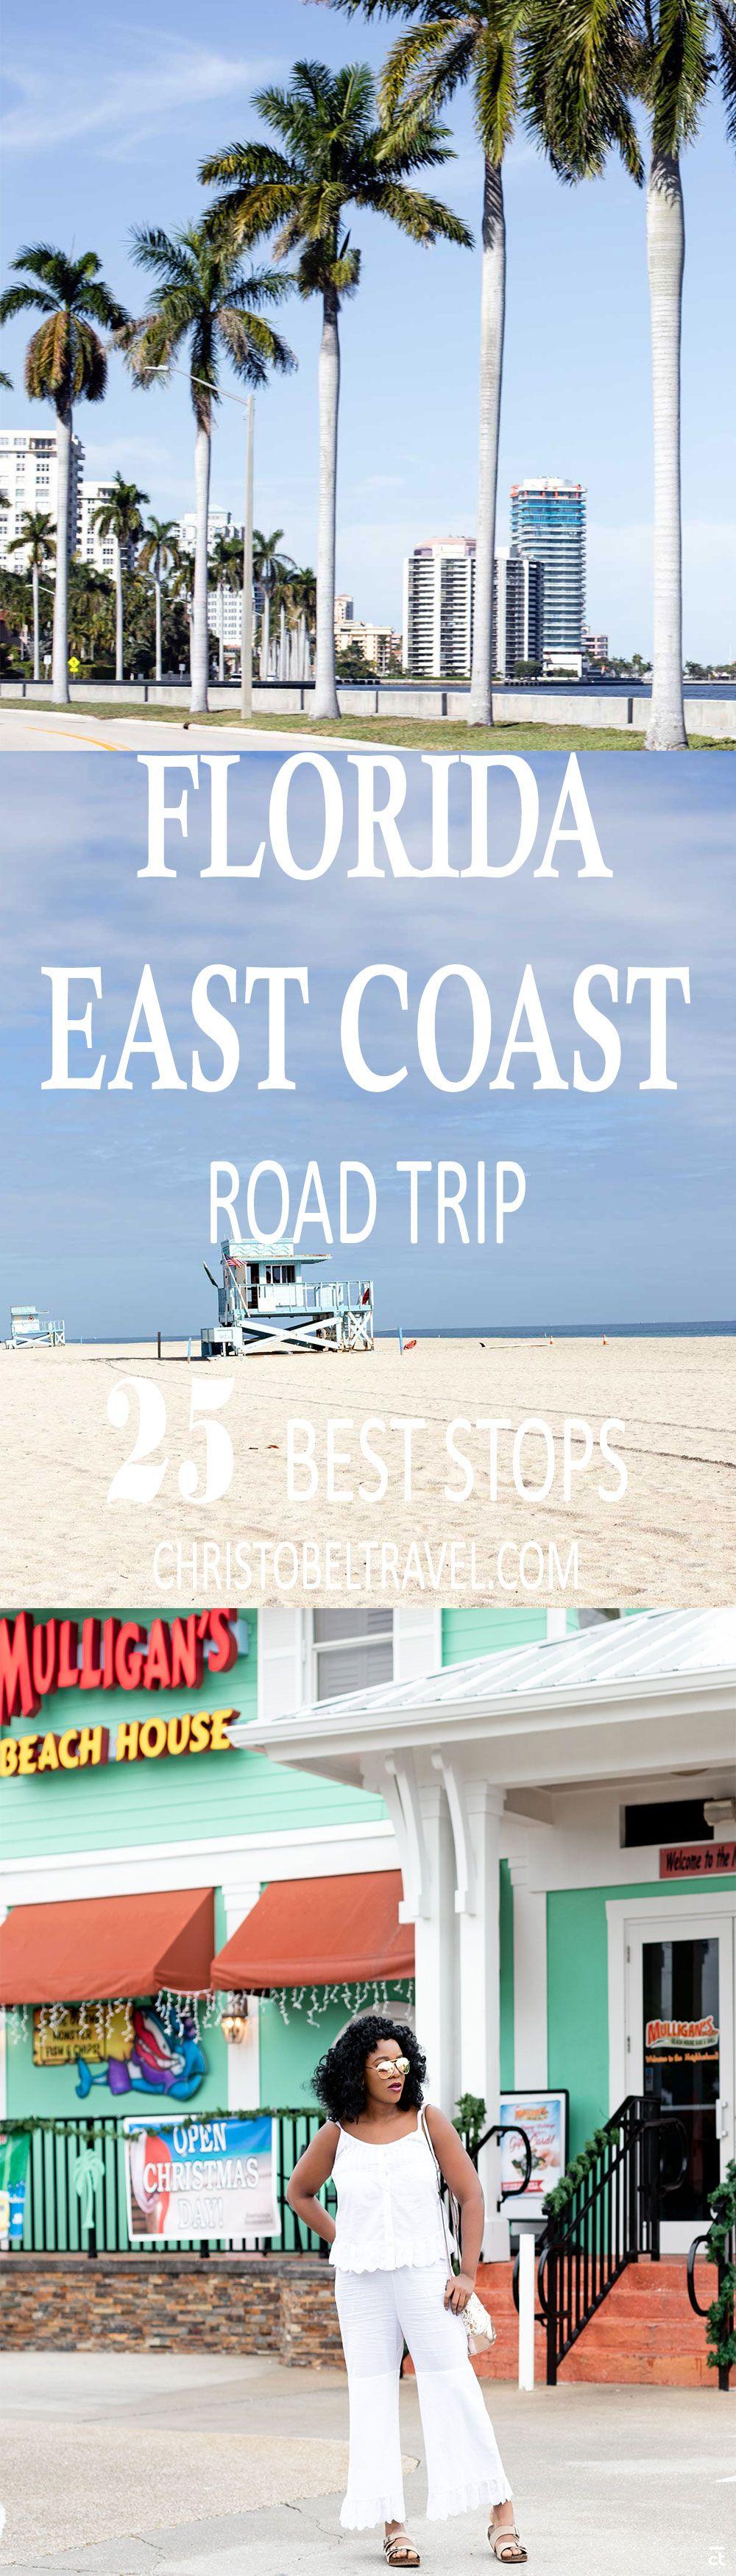 Florida East Coast Road Trip 25 Best Stops The Florida East Coast Road Trip Is One Of The Most Scenic Driv Florida East Coast East Coast Road Trip Road Trip